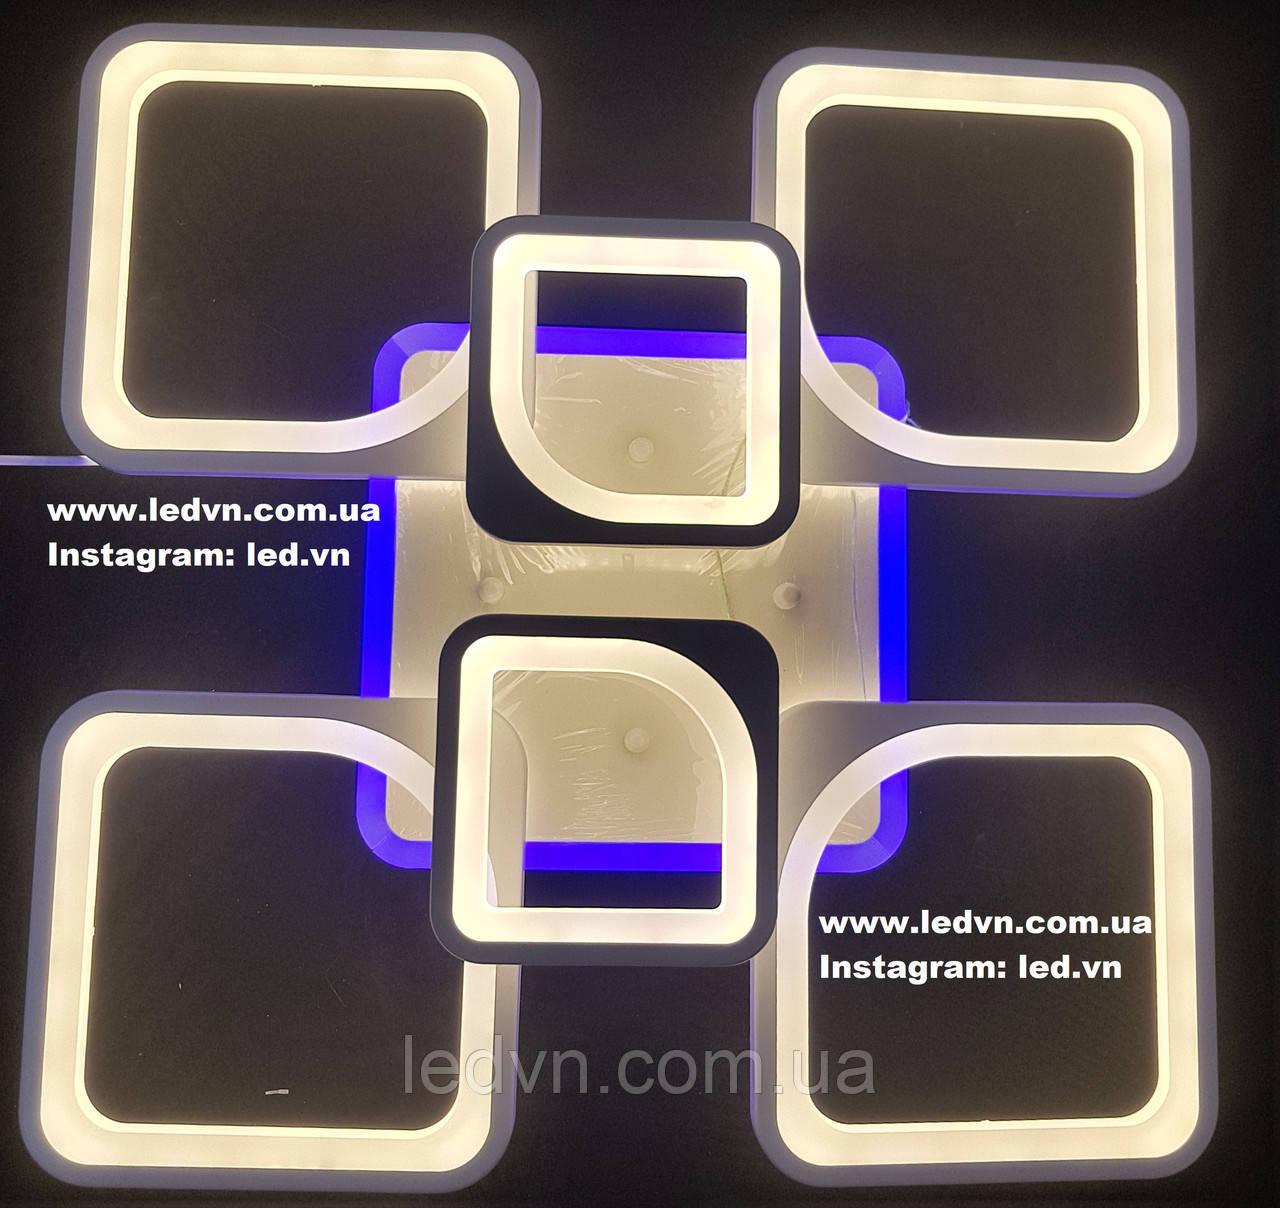 Светодиодная (led) люстра 4+2 квадрата с синей подсветкой белая